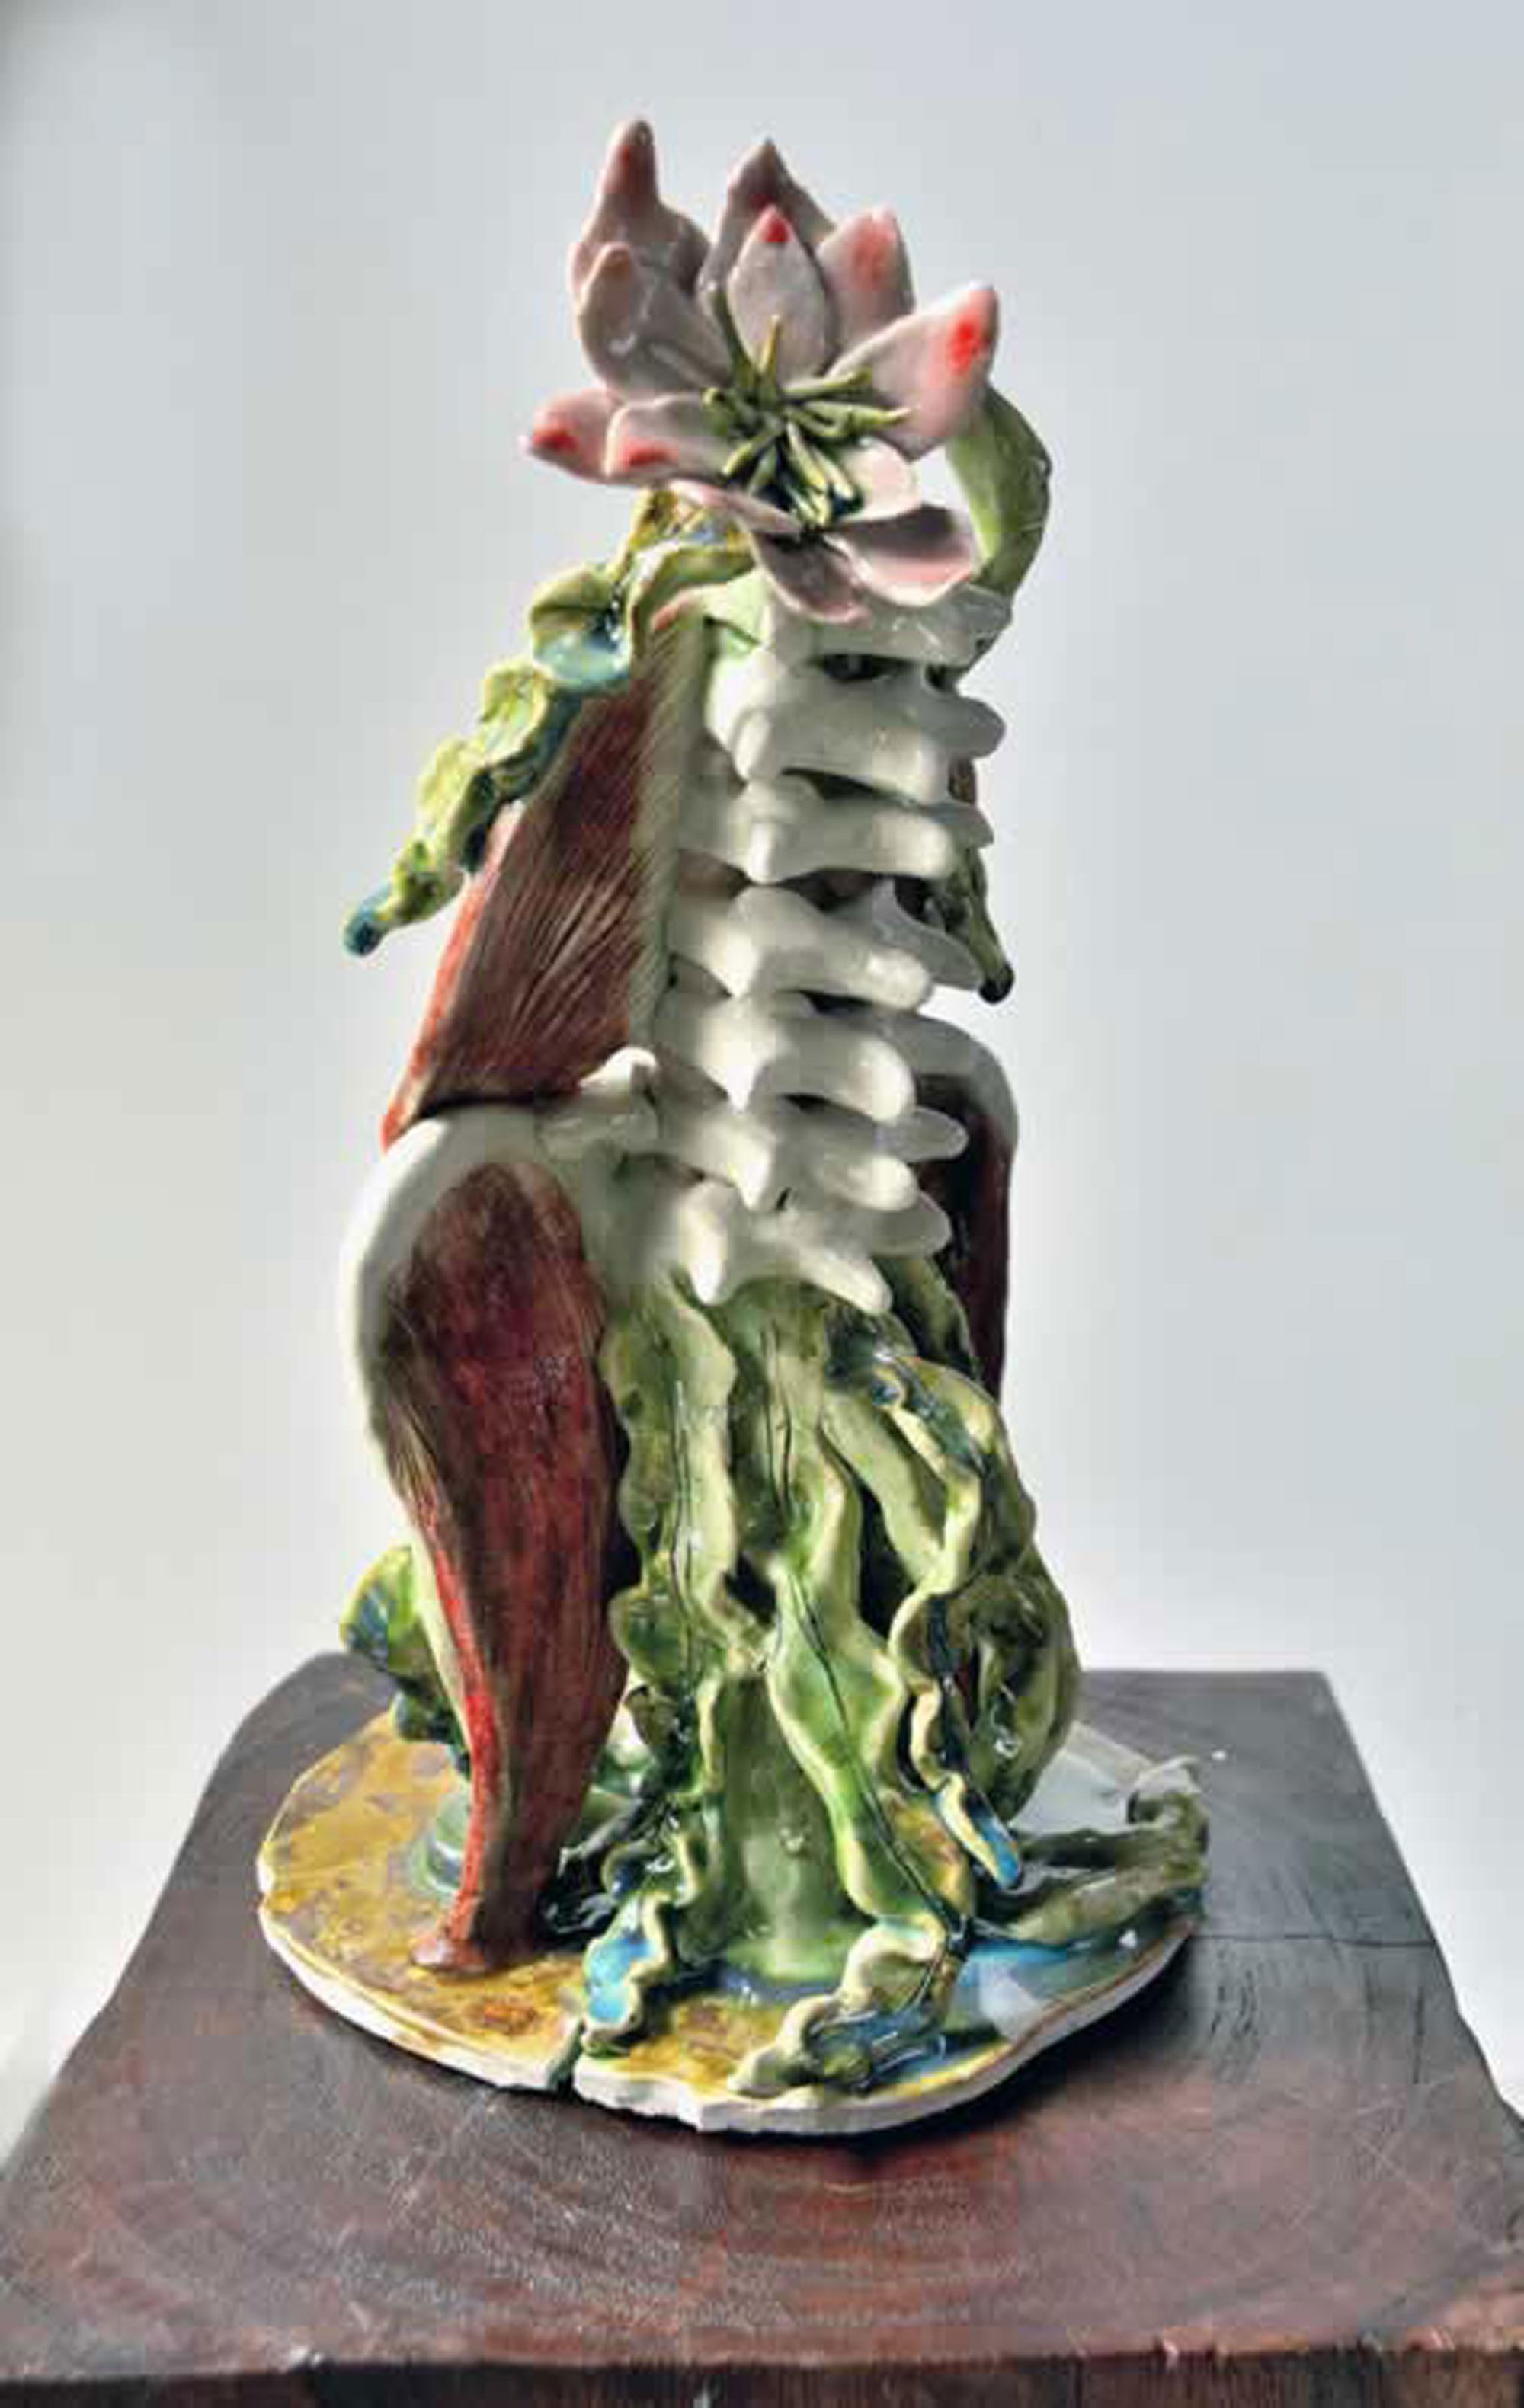 (2)-columna-y-cactus-jimena-schlaepfer